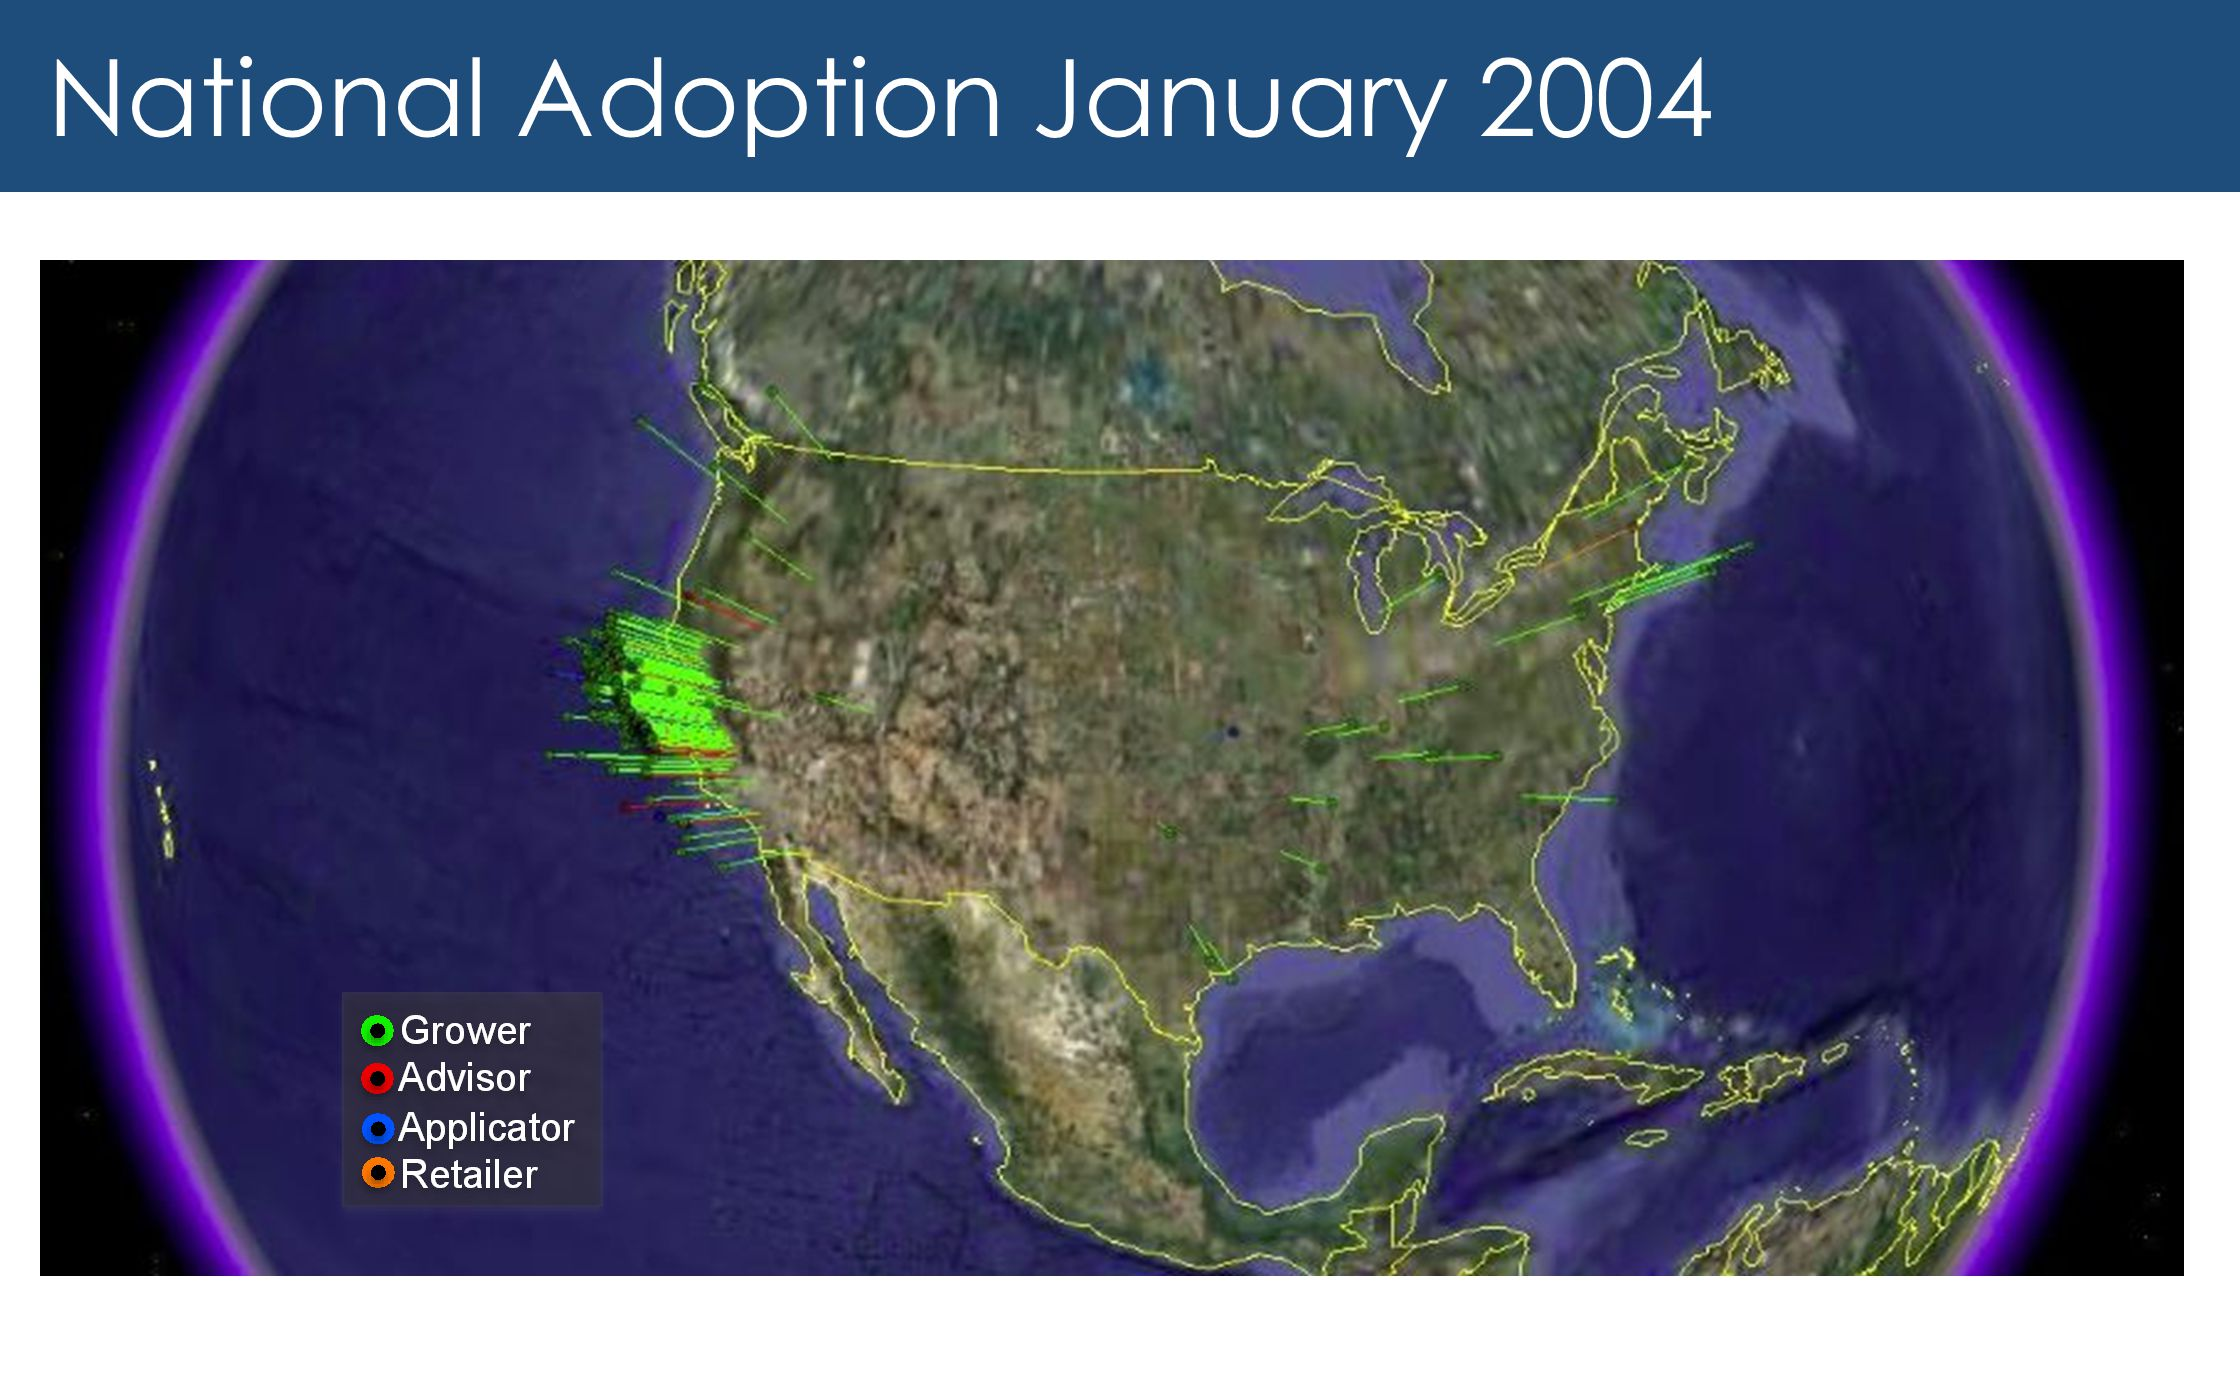 National Adoption January 2004